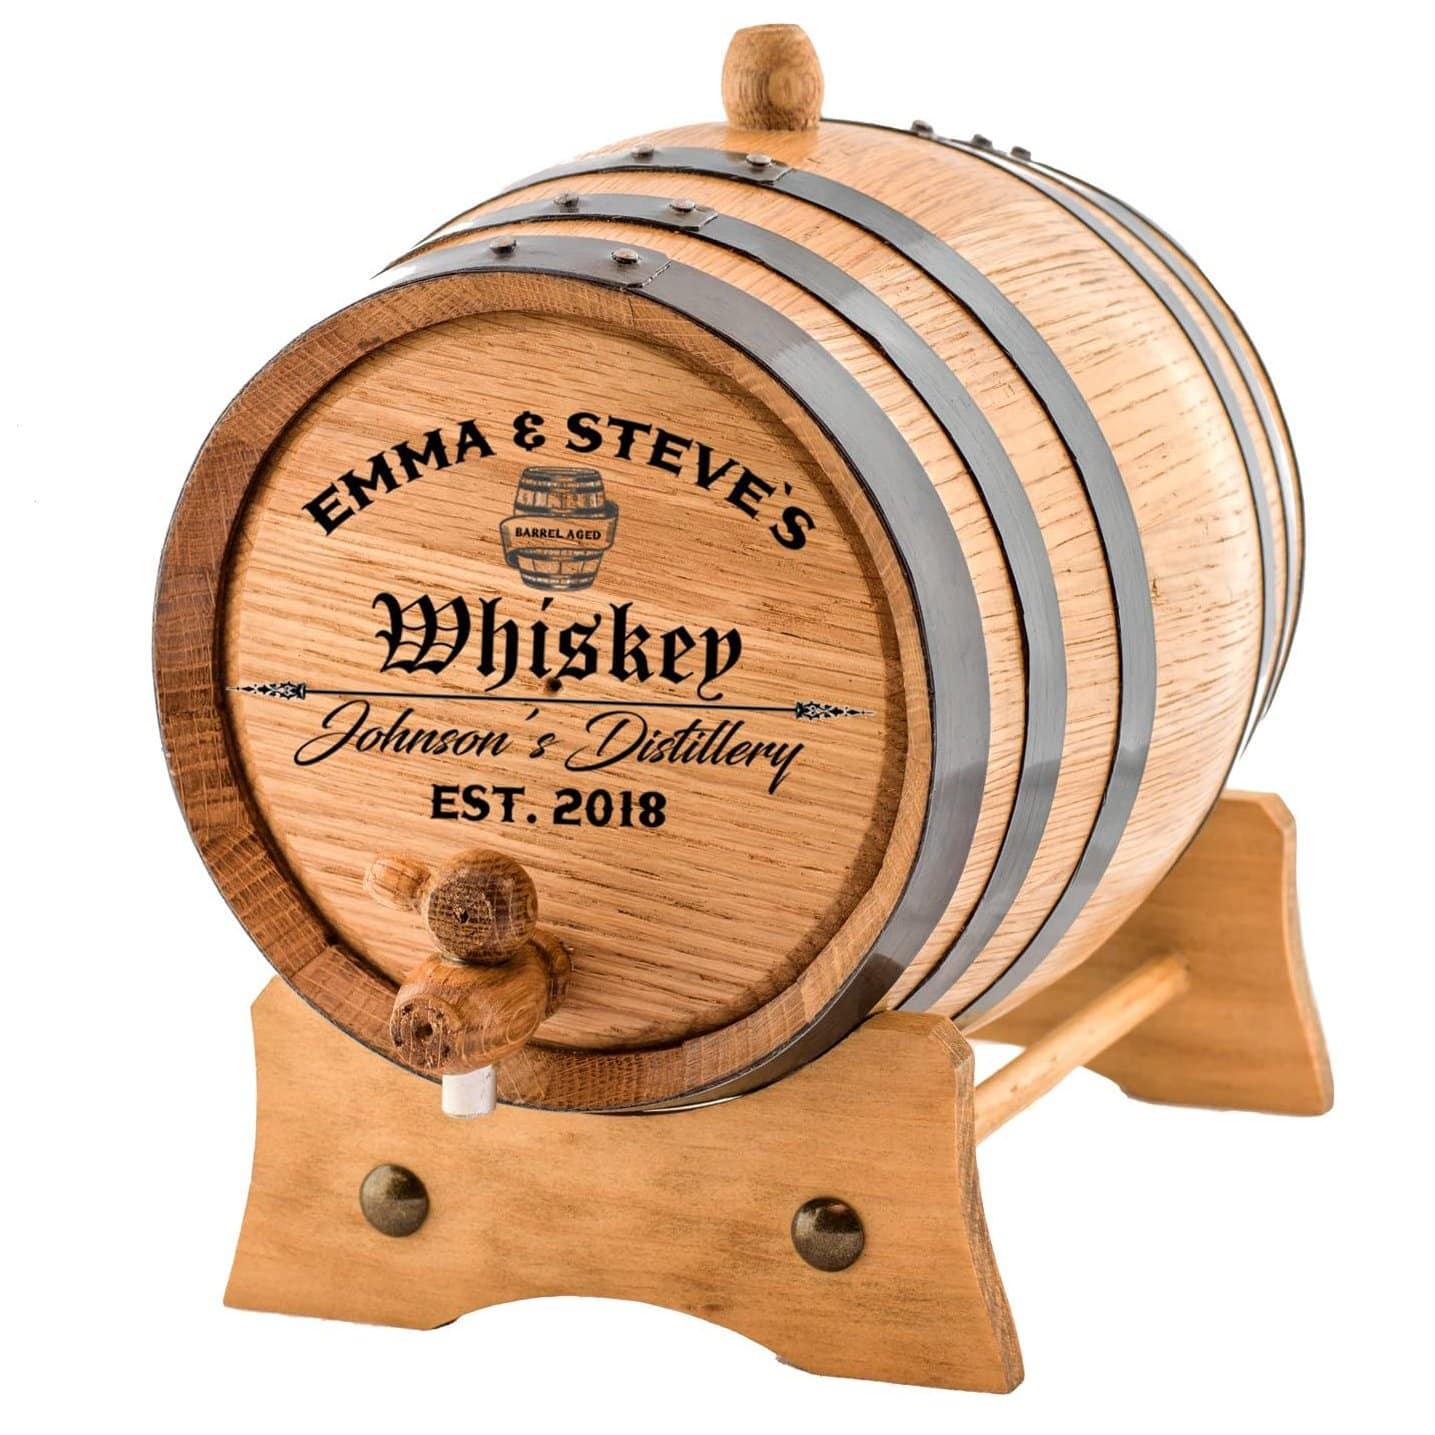 Custom cask barrel showing personalized labeling